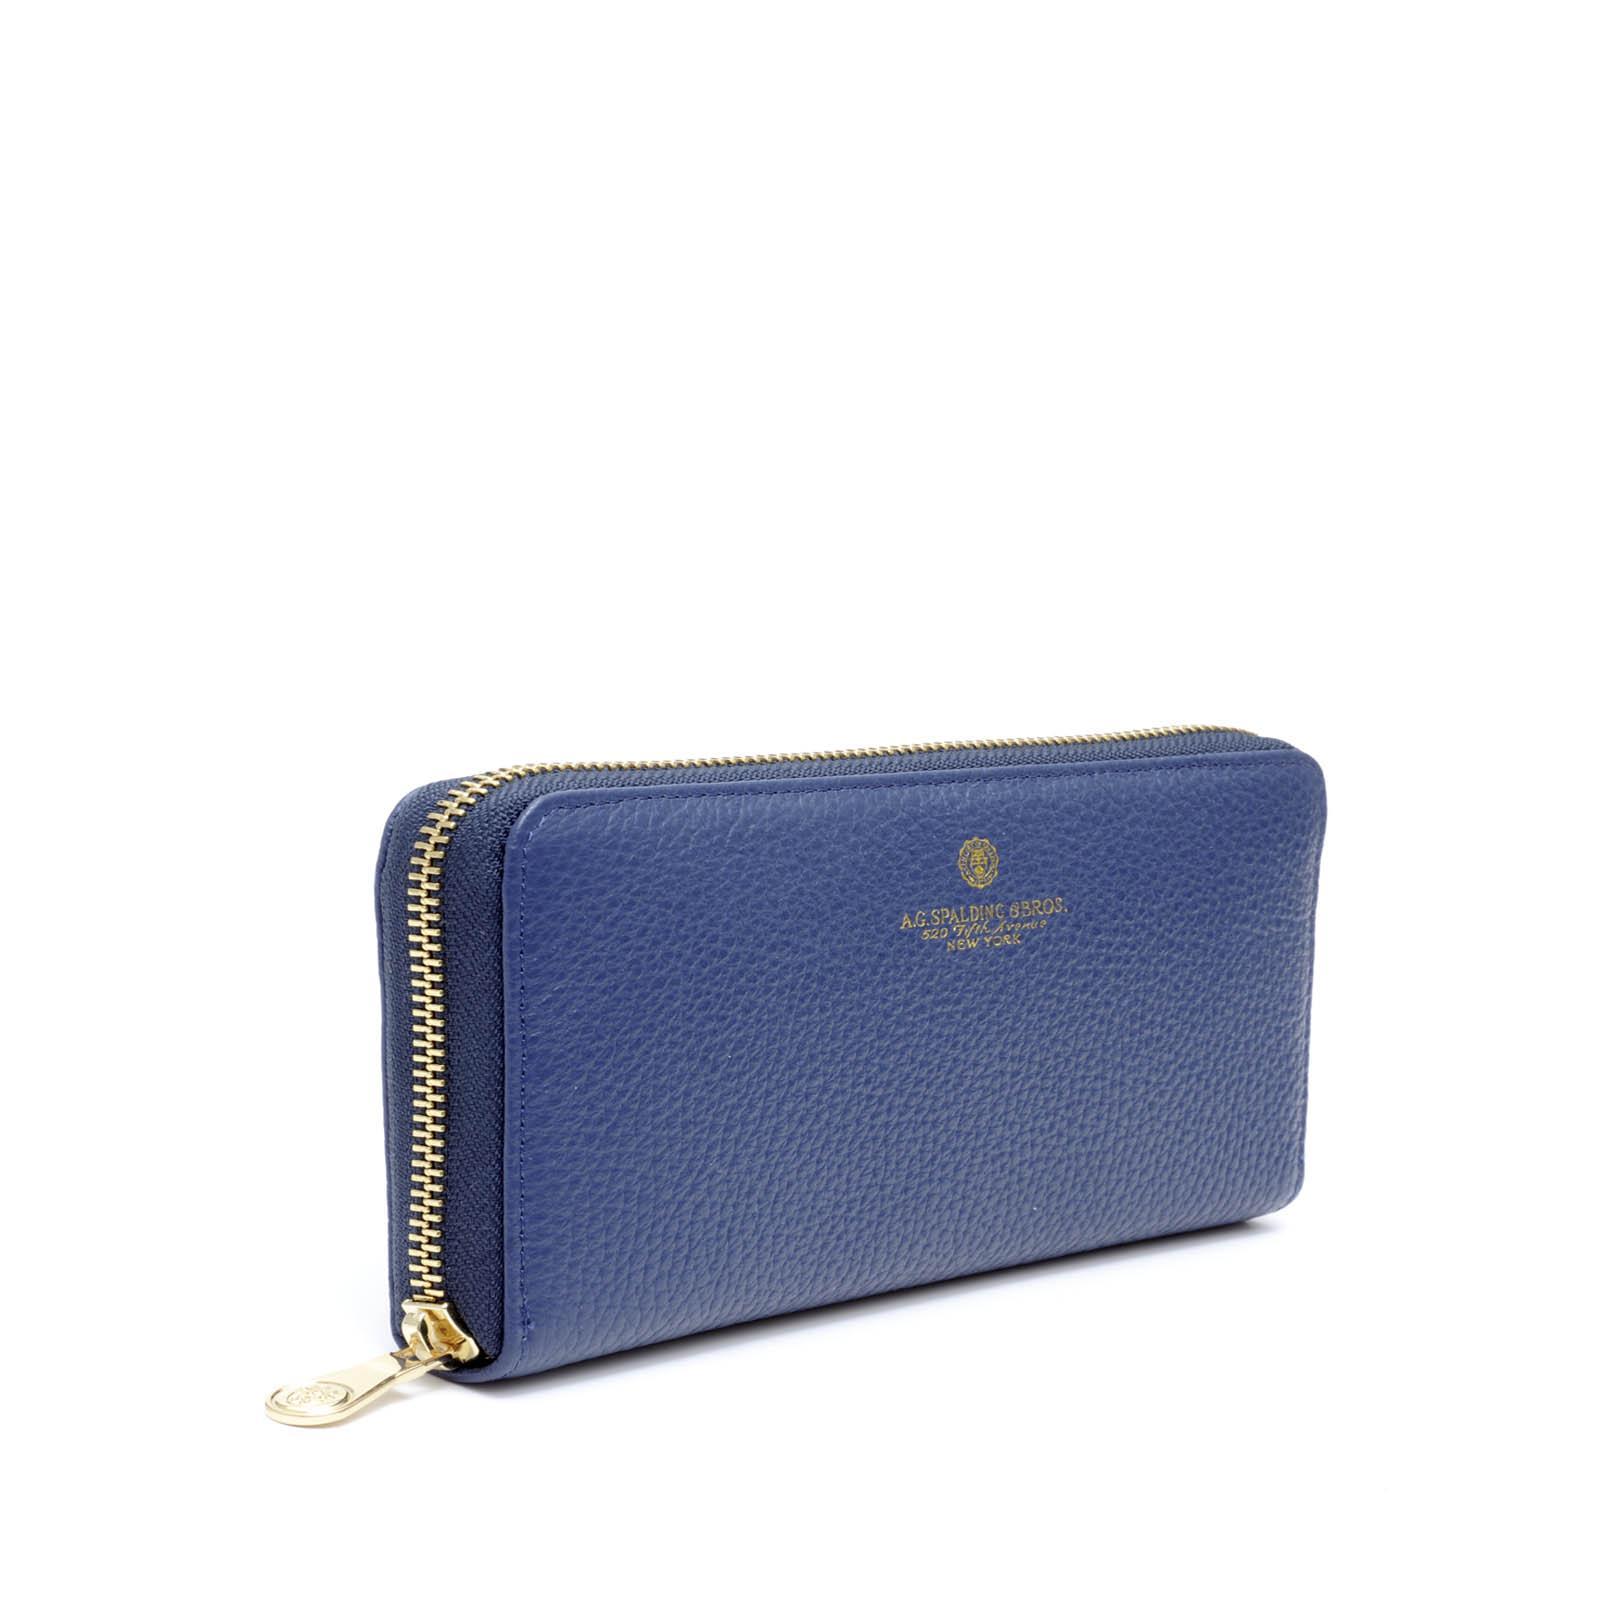 Tiffany Portafoglio Zippato Blu